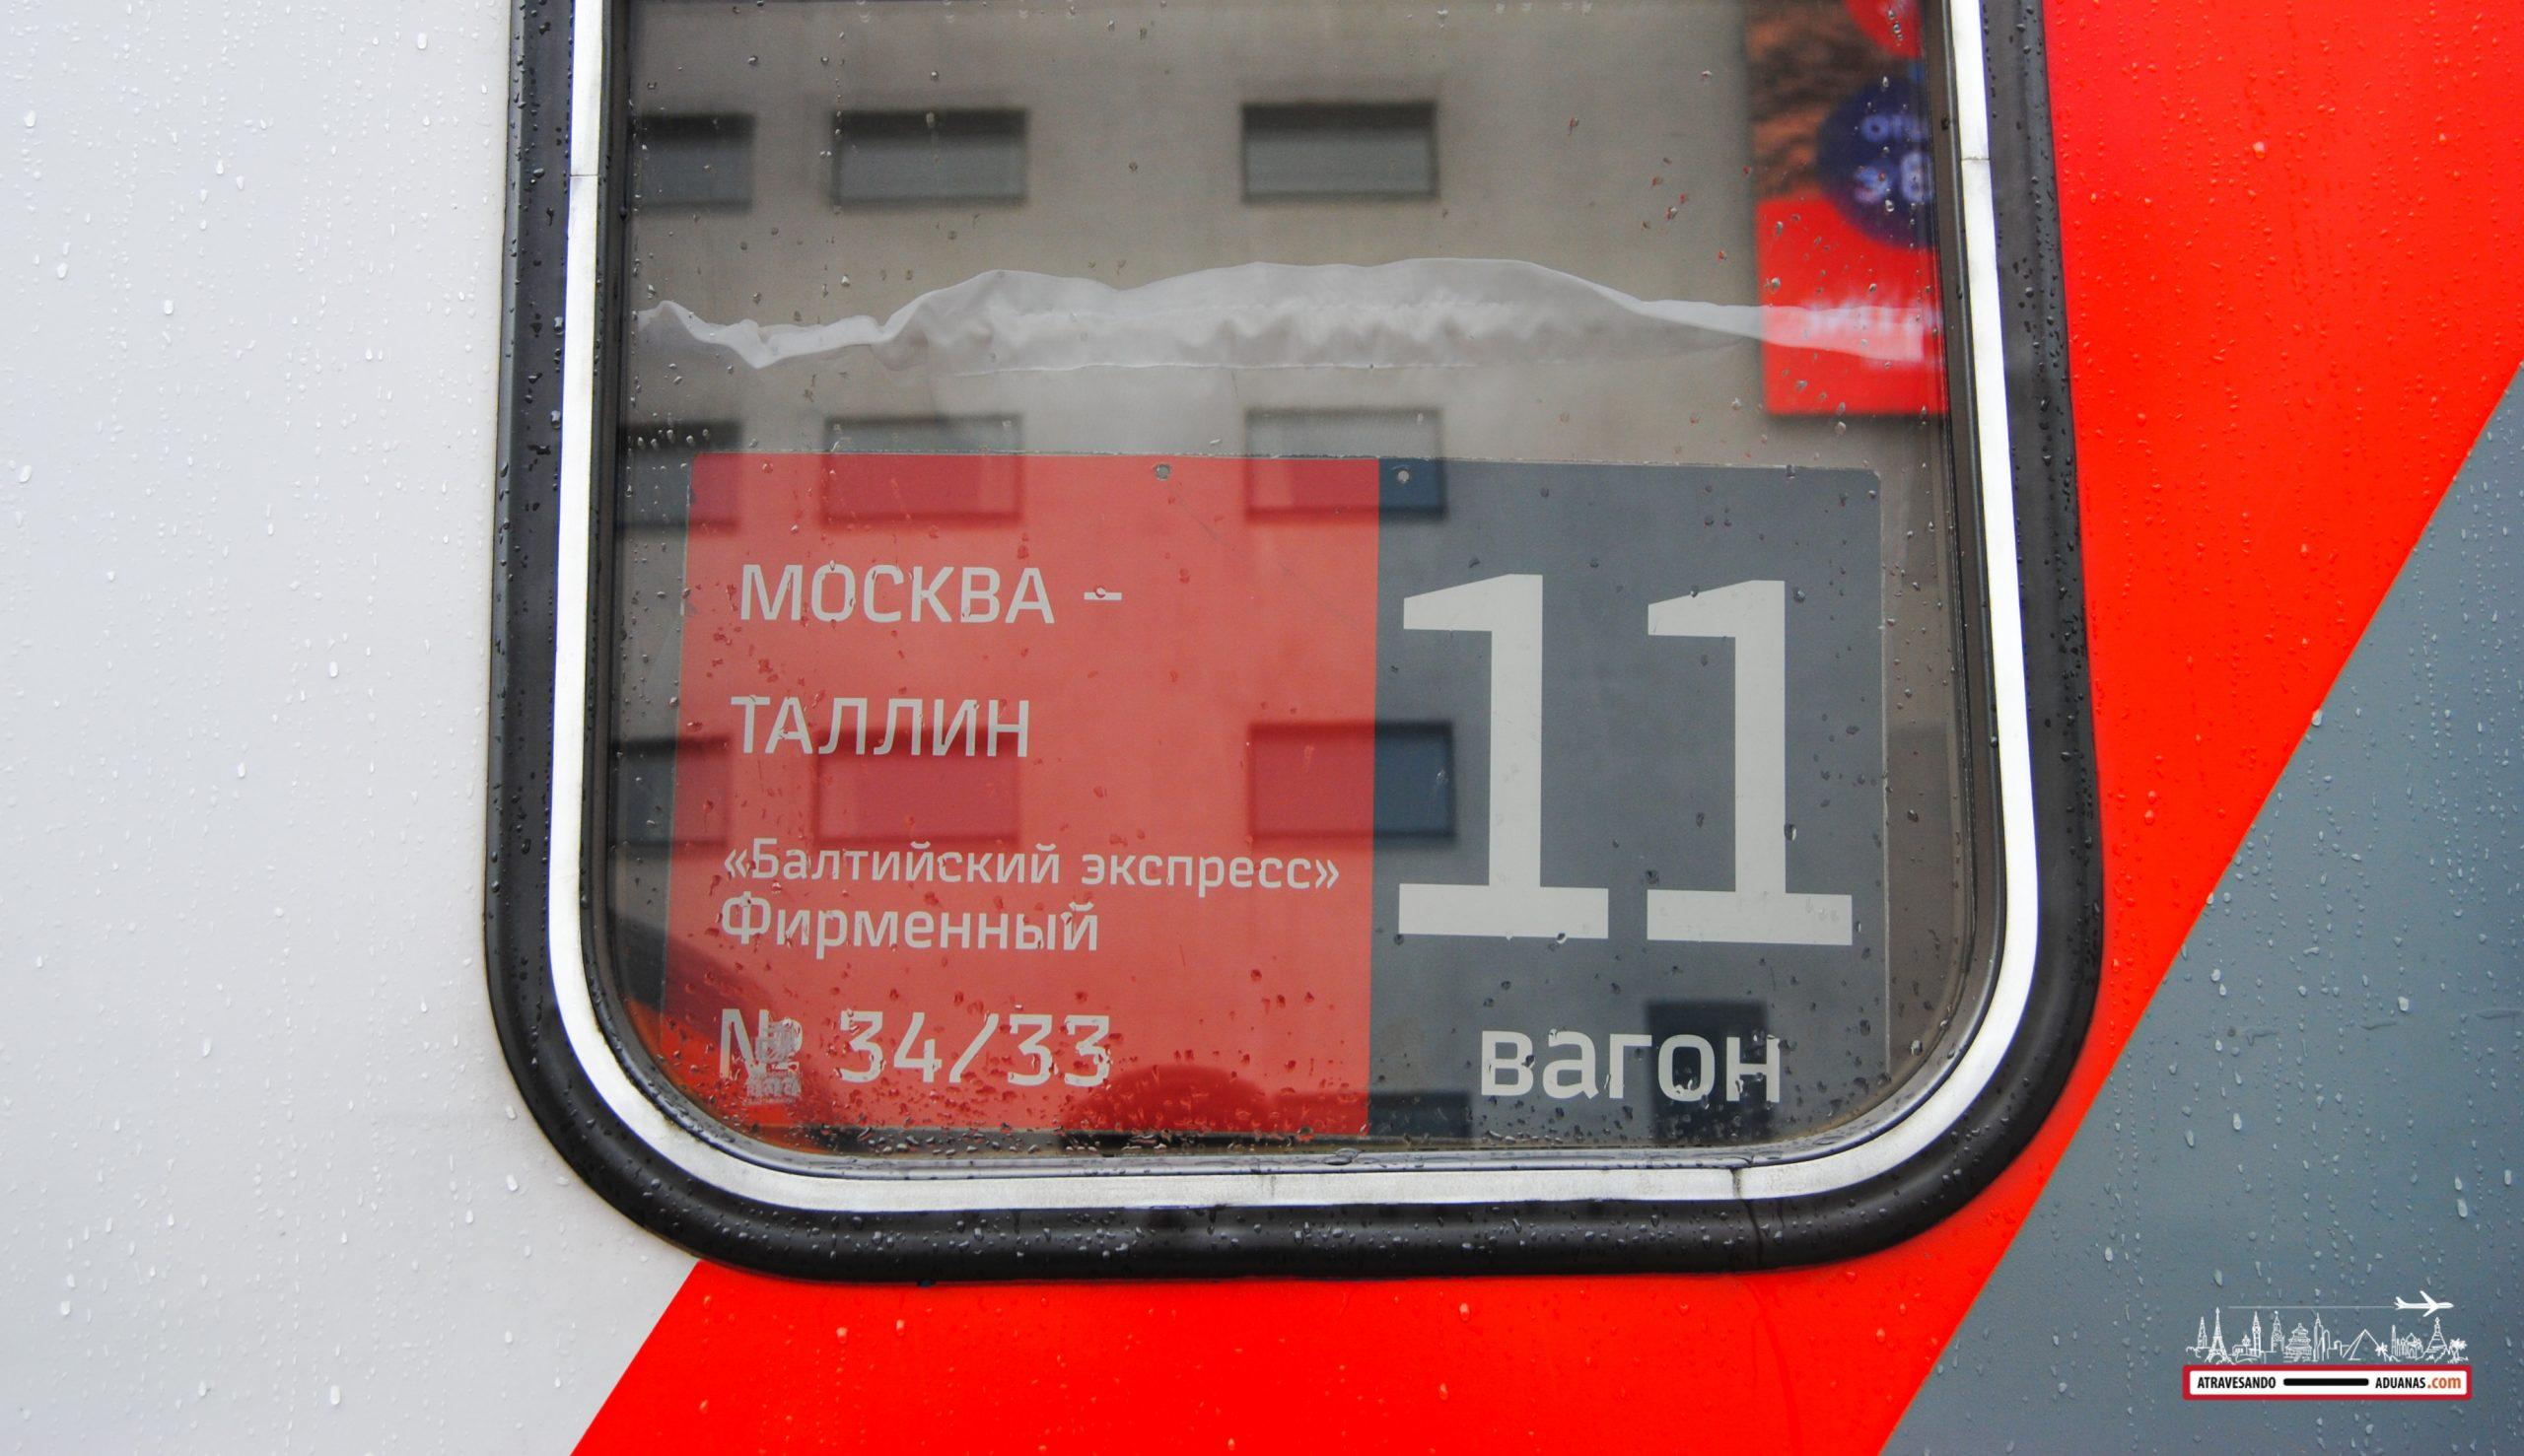 tren operando la ruta Moscú - Tallinn